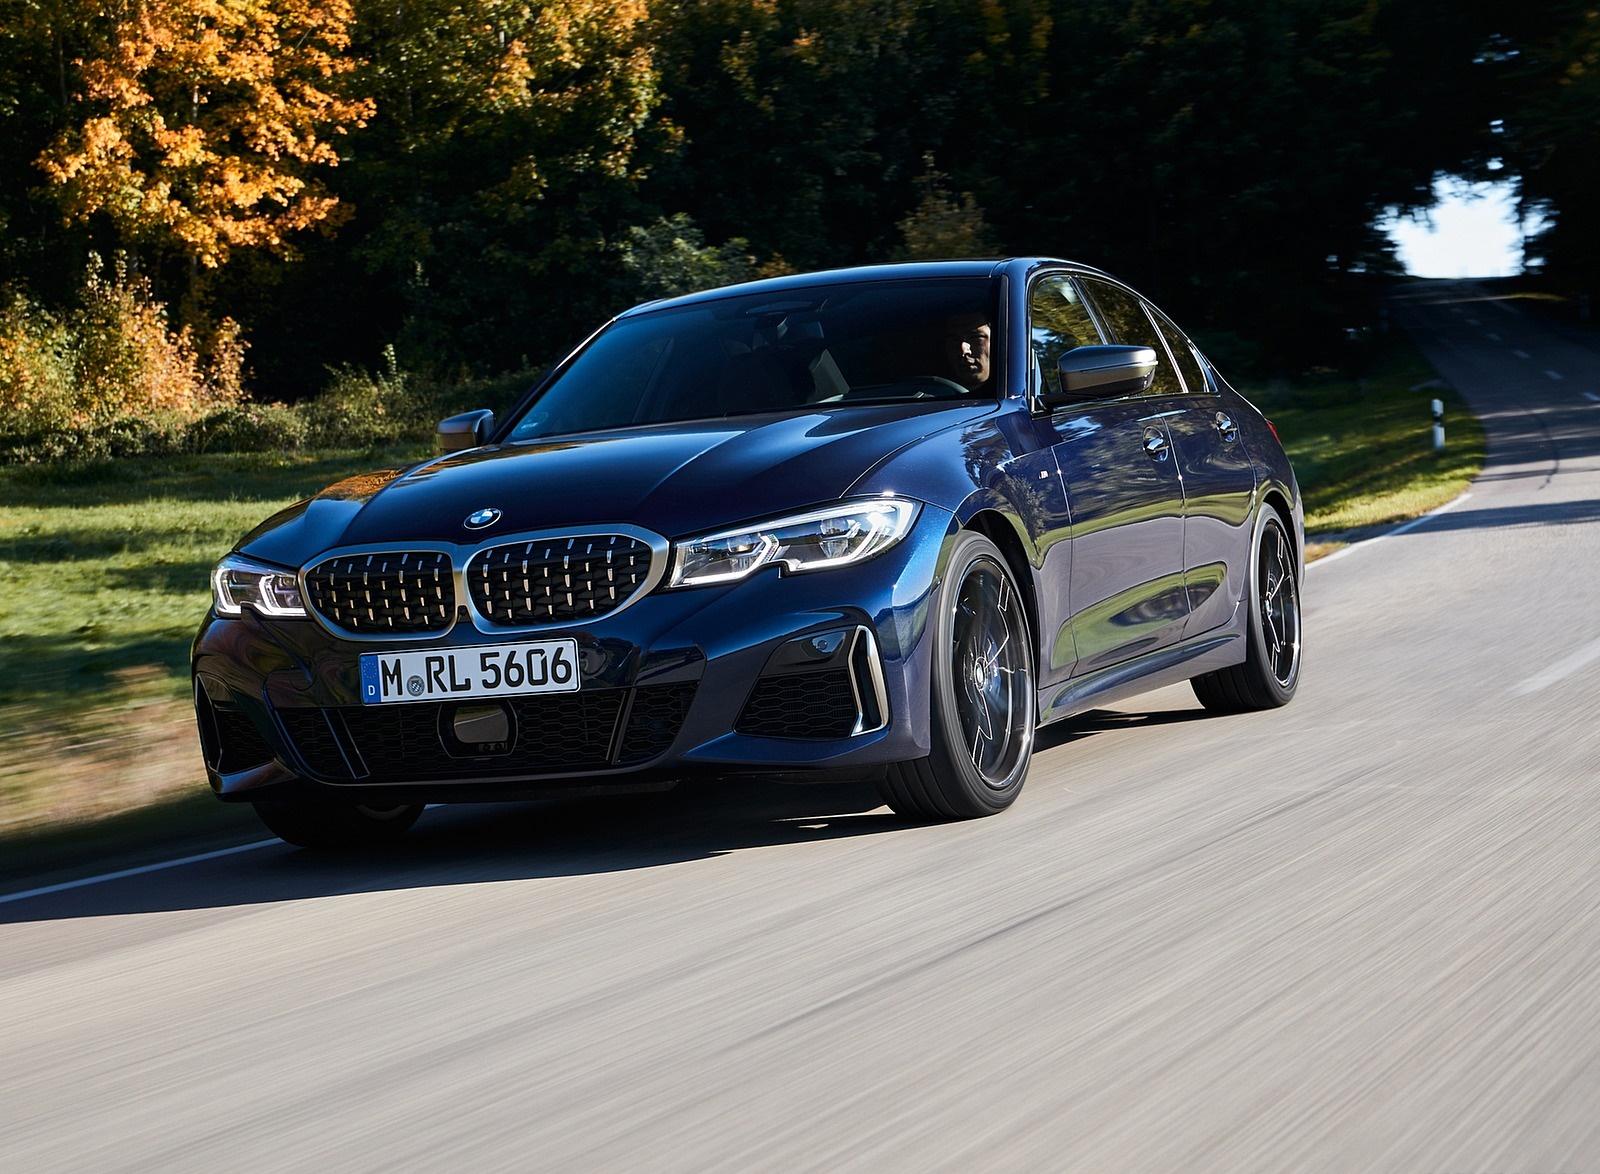 2020 BMW M340i Sedan (Color: Tanzanite Blue Metallic) Front Three-Quarter Wallpapers #14 of 74